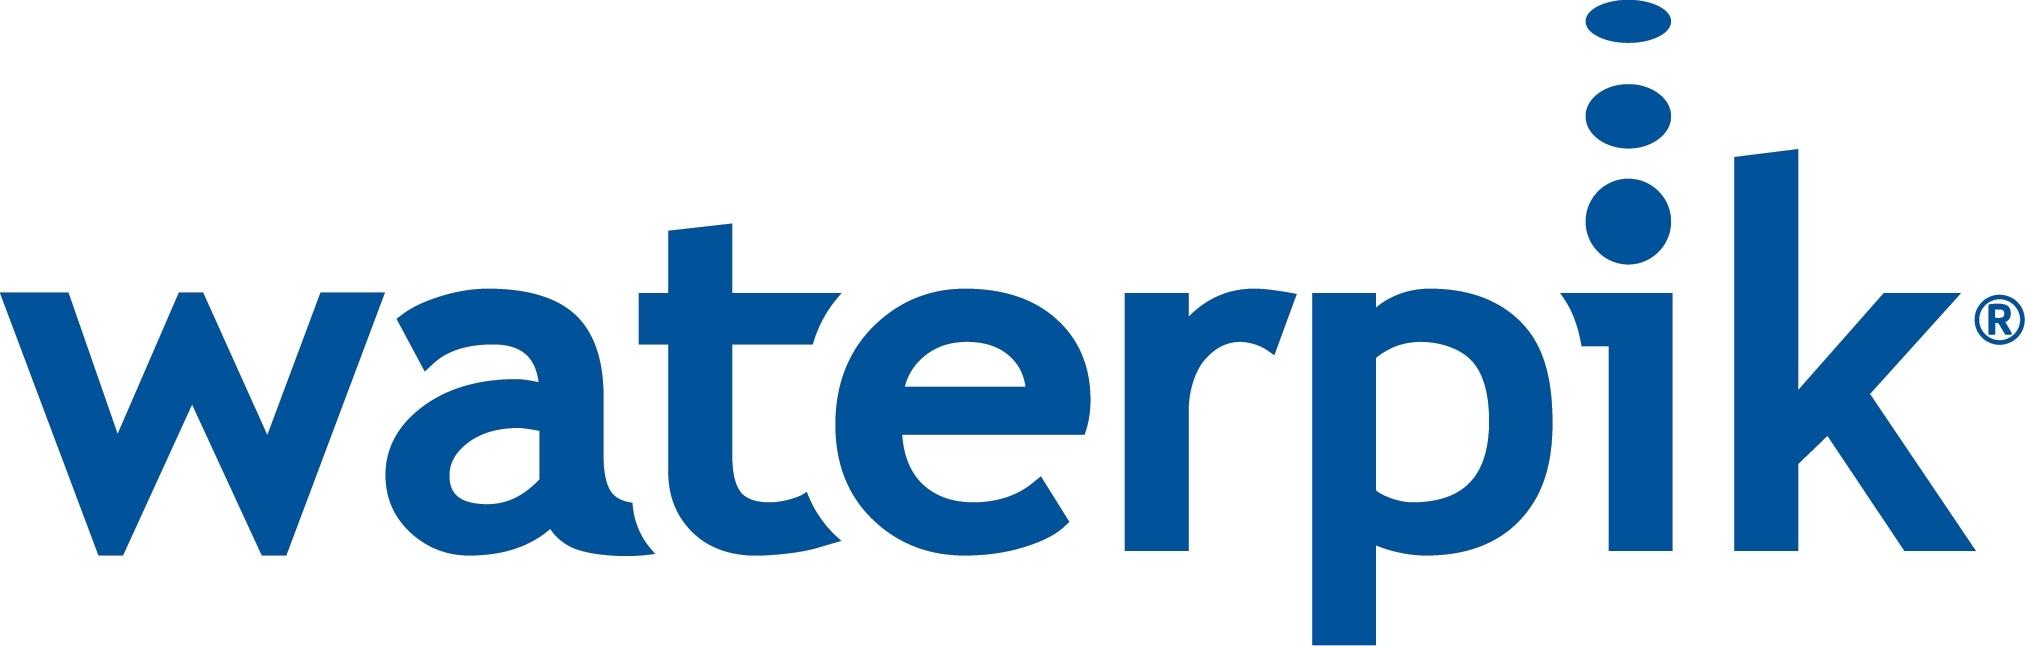 2006-waterpik-blue-logo-only-04-17-06.jpg